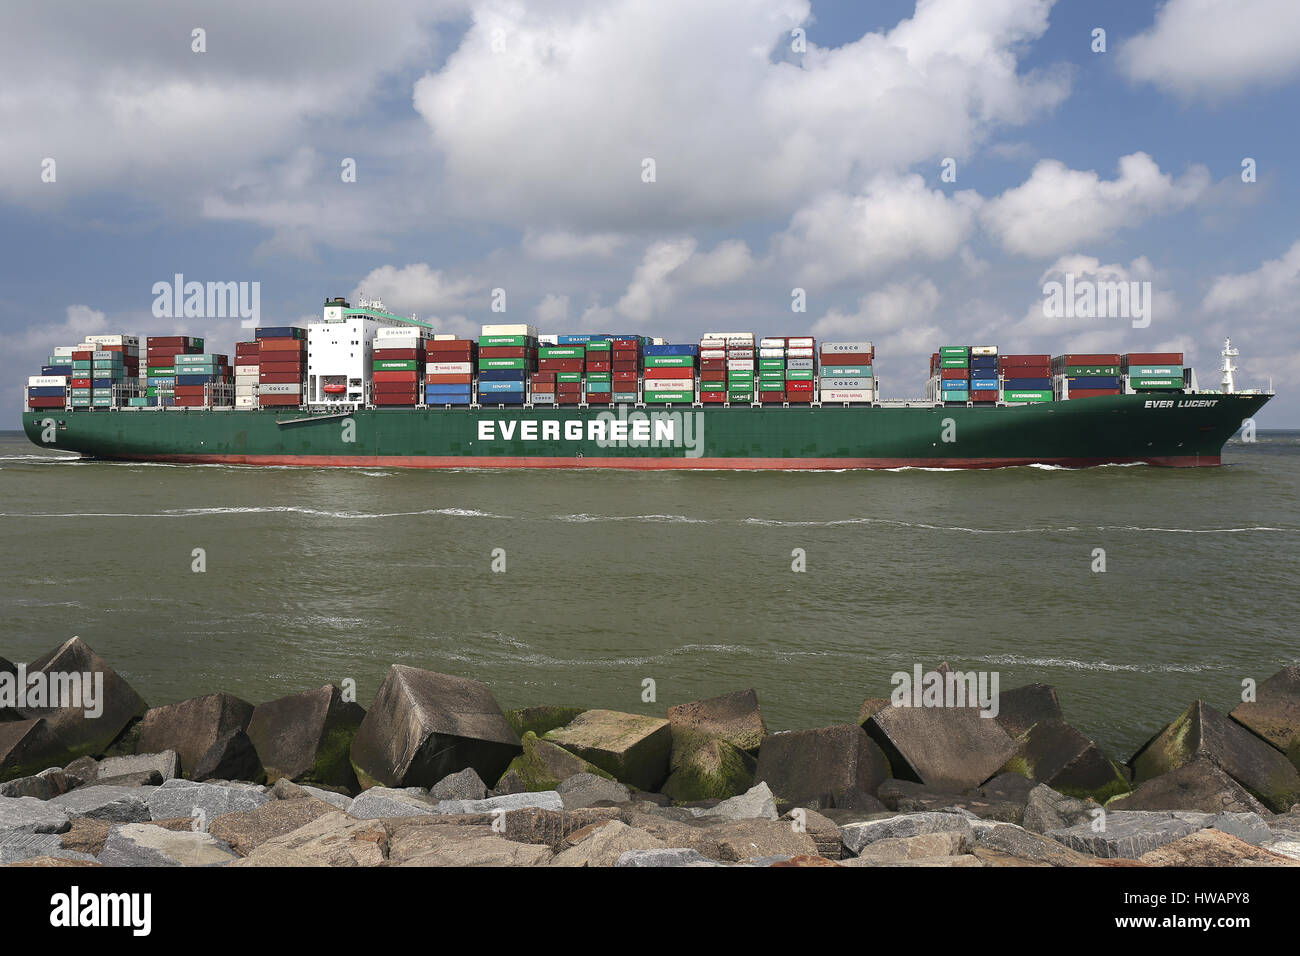 EVER LUCENT inbound Rotterdam - Stock Image